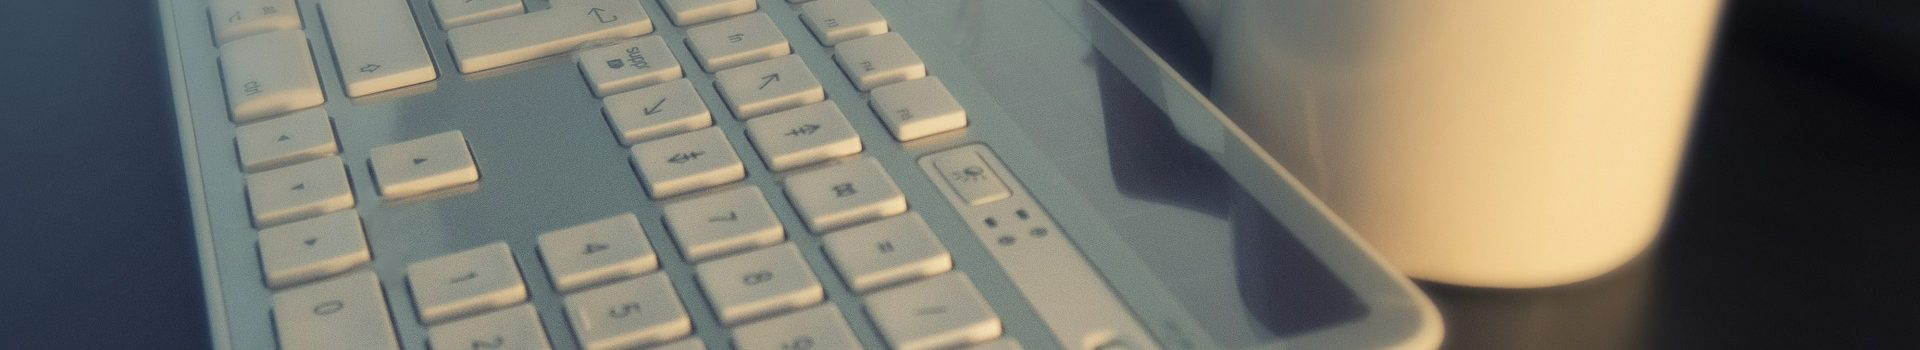 keyboard-561124_1920